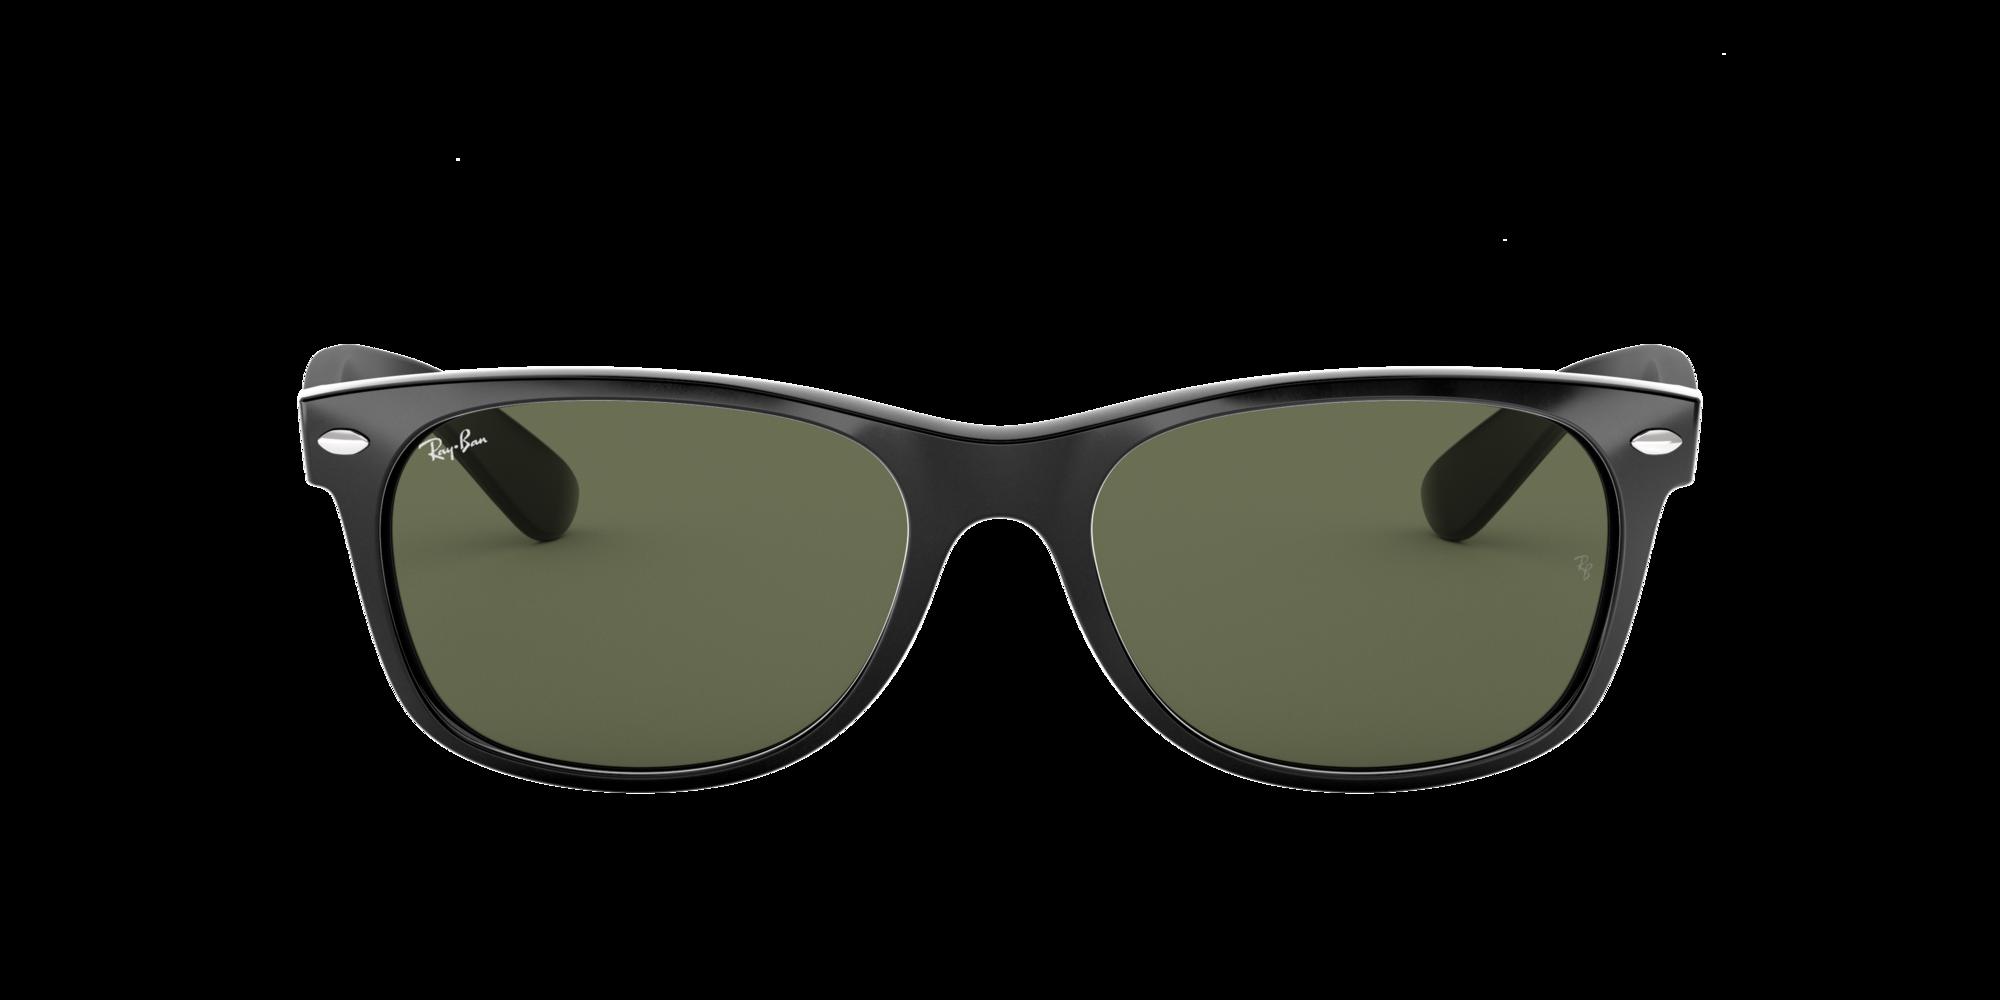 Image for RB2132 58 NEW WAYFARER from LensCrafters | Glasses, Prescription Glasses Online, Eyewear